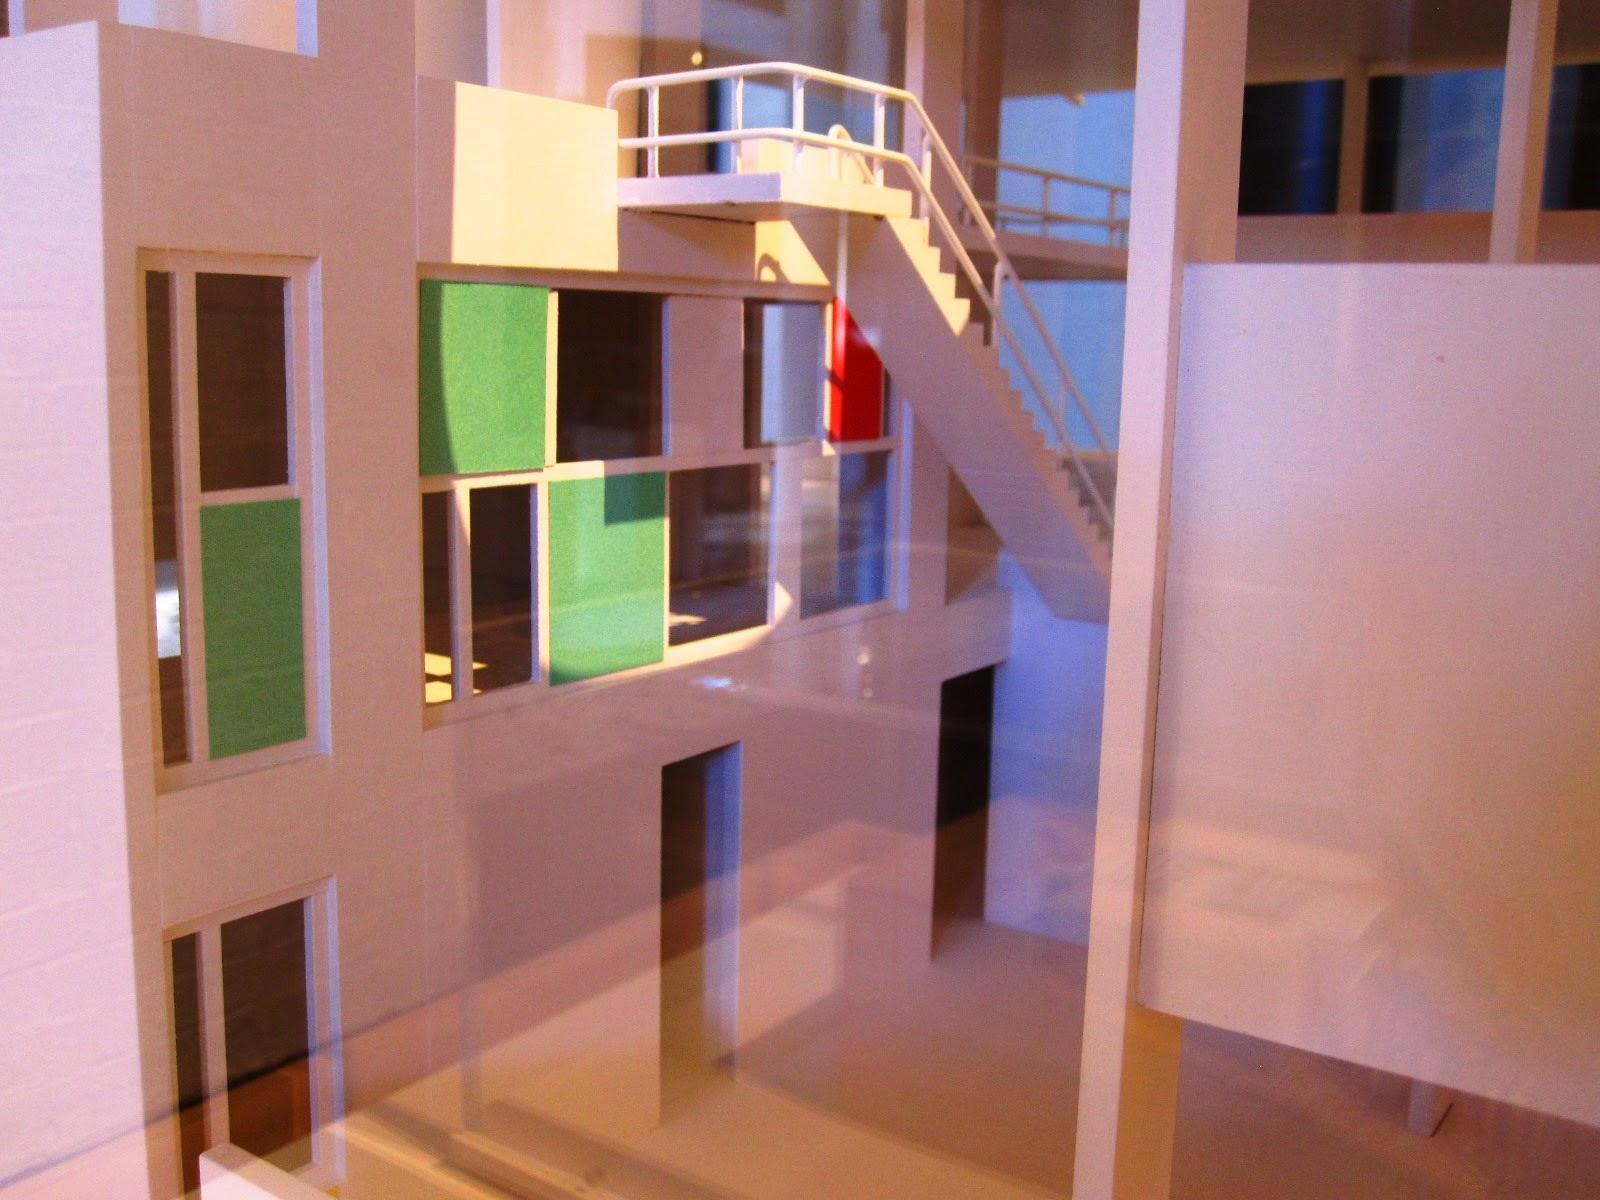 View of internal courtyard of a model of Le Corbusier's Villa Shodhan.